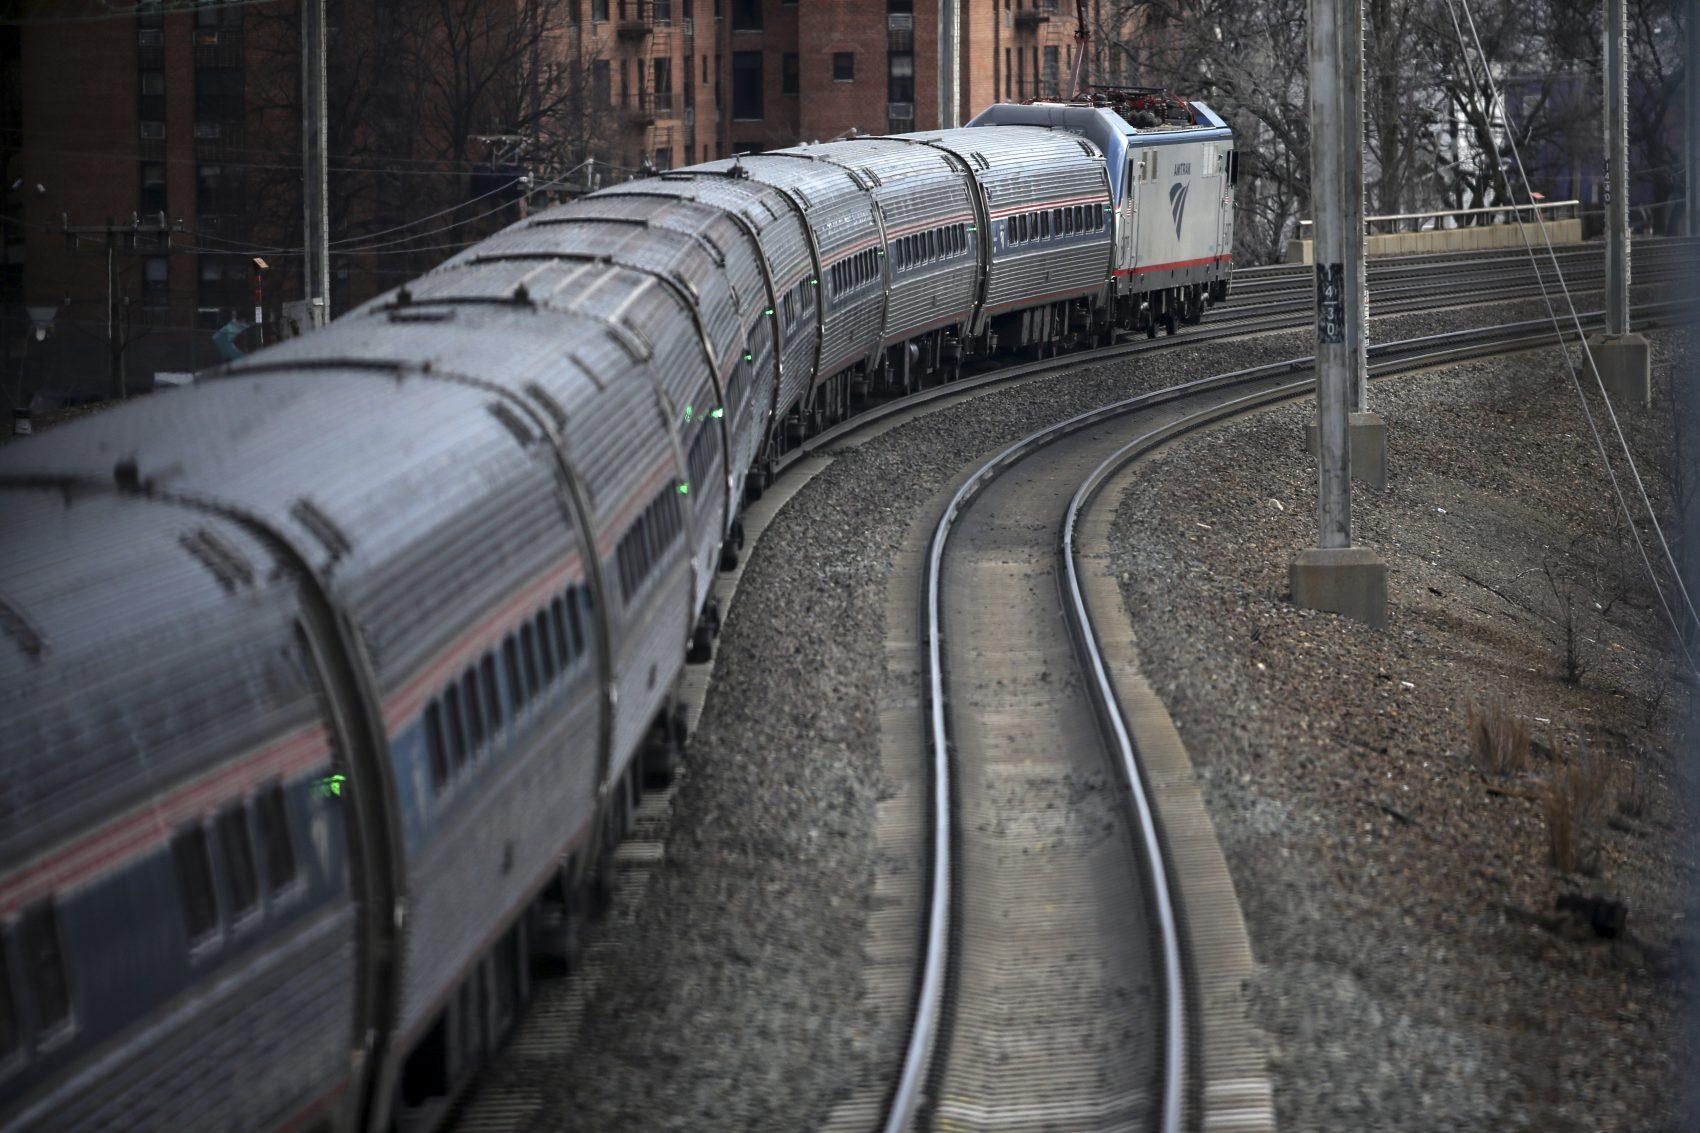 An Amtrak train passes through Elizabeth train station in March 2016, in Elizabeth, N.J., along Amtrak's Northeast Corridor. (Mel Evans/AP)